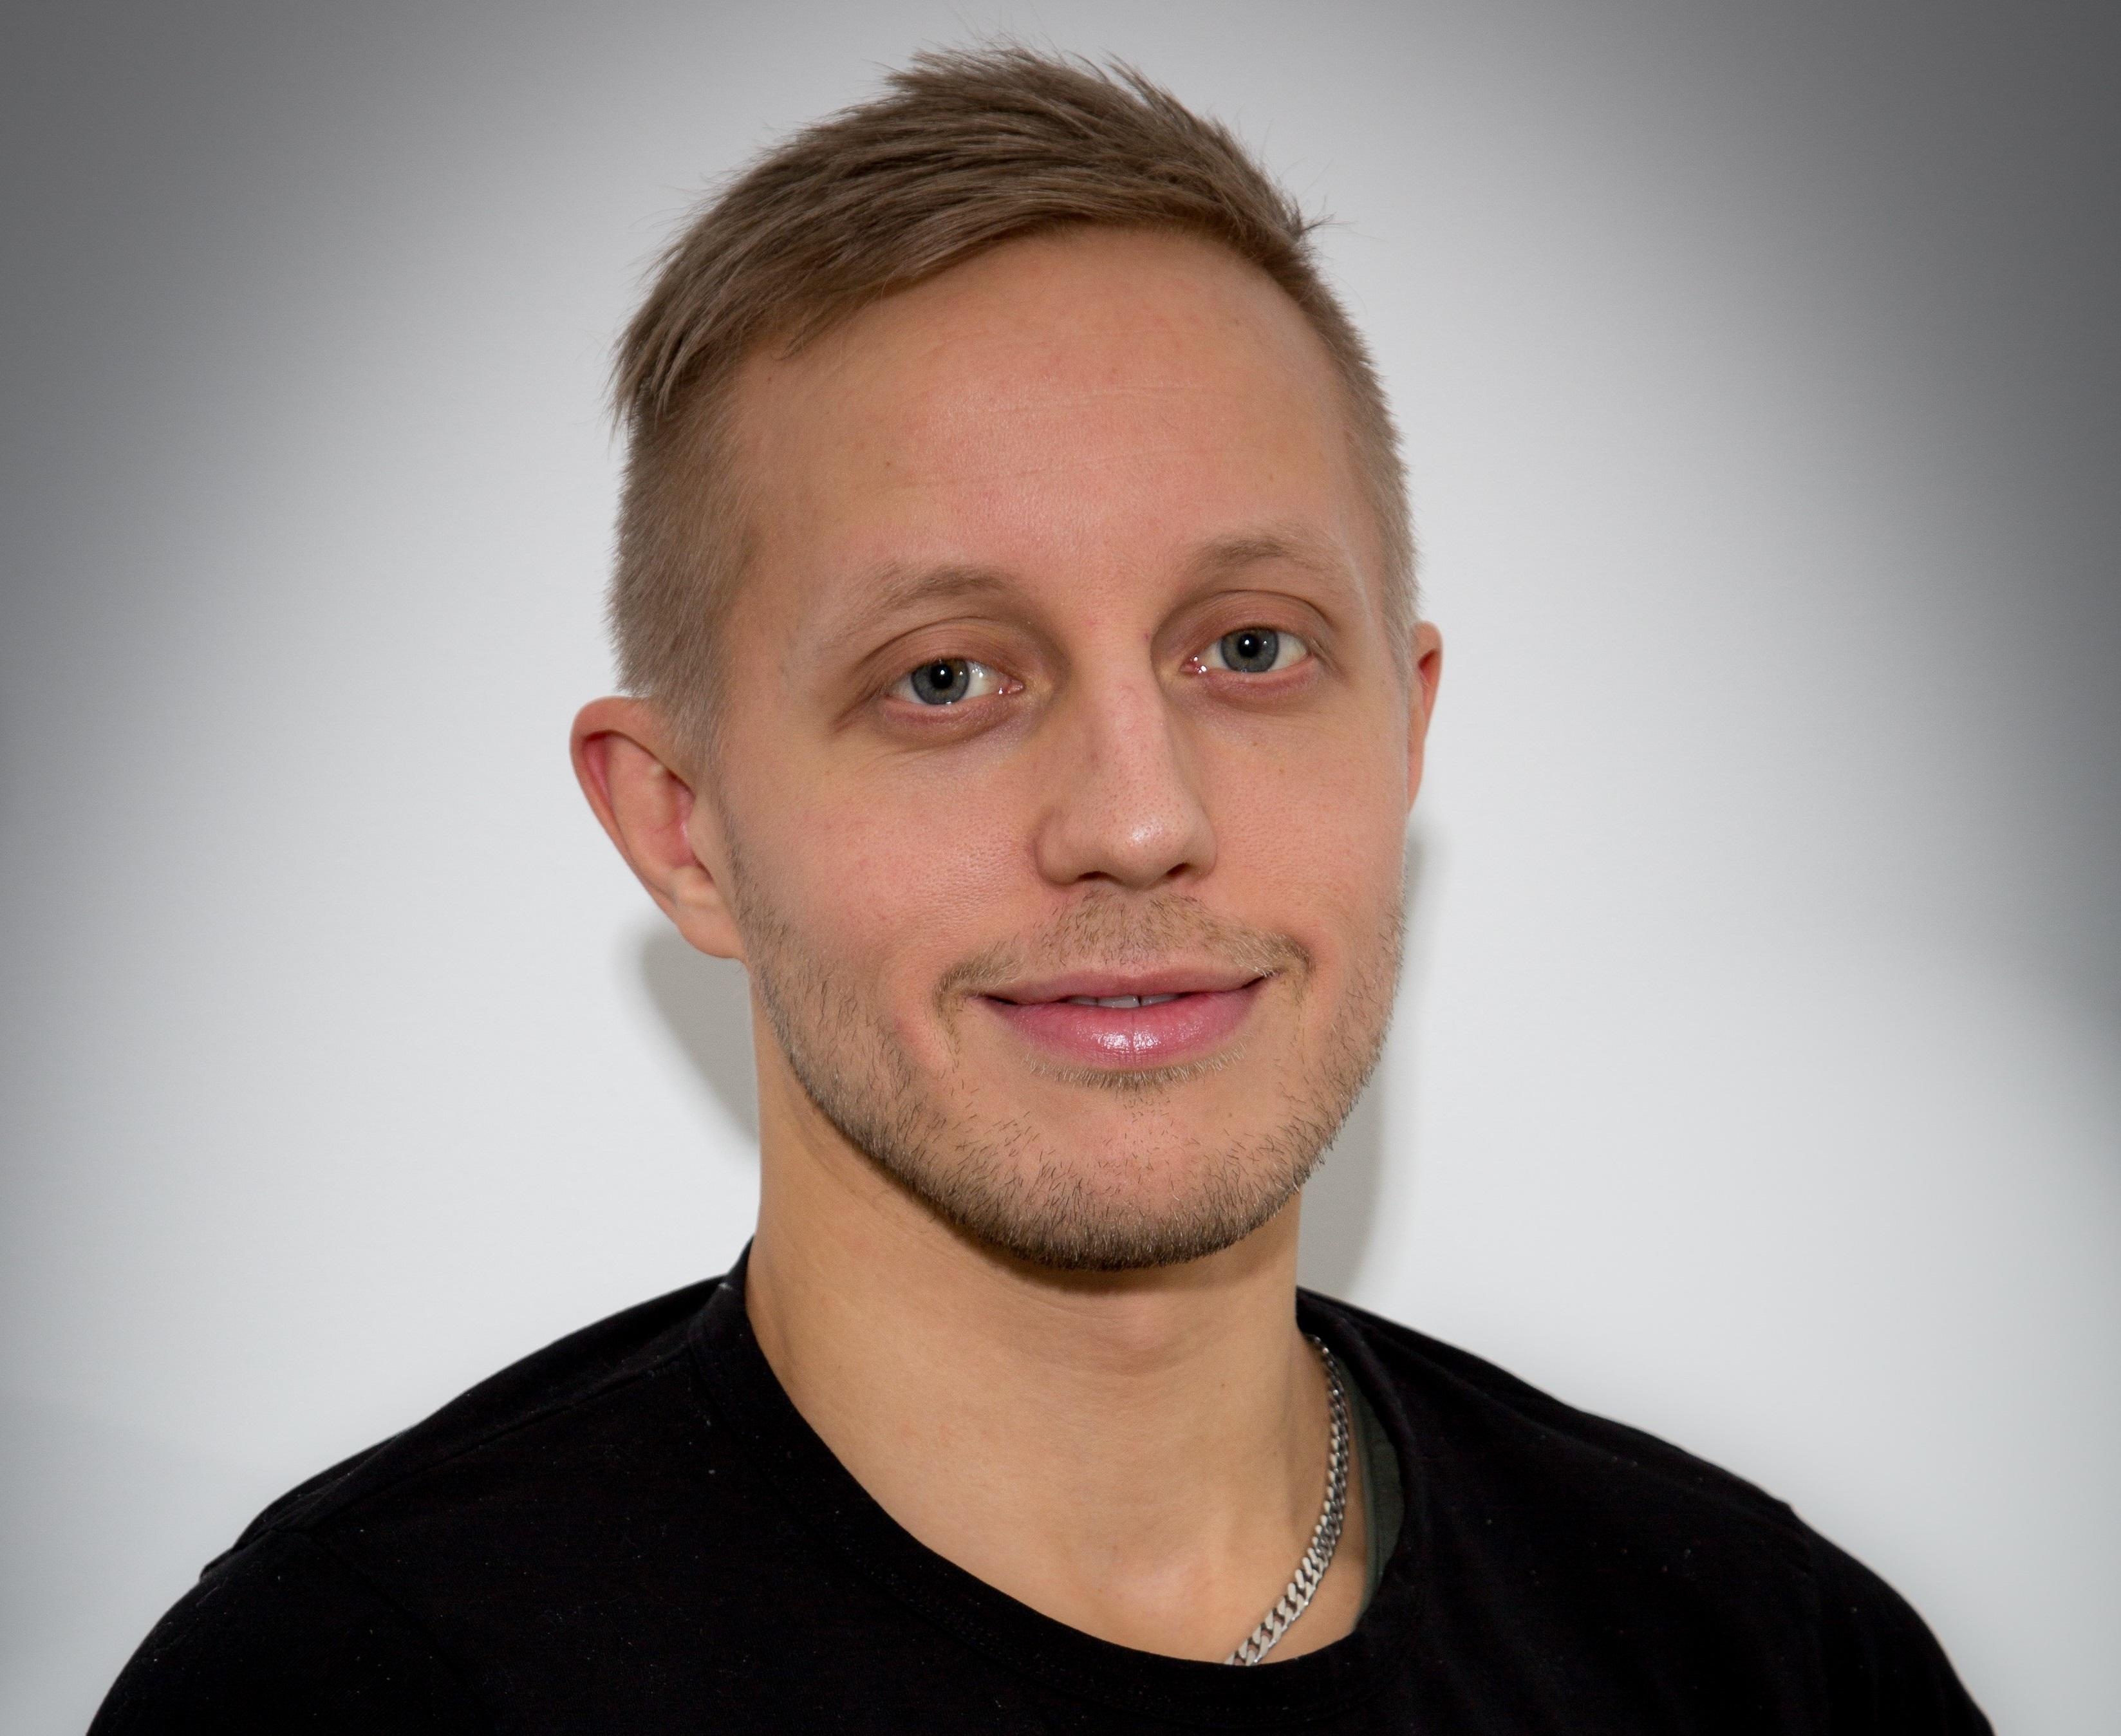 Mika Hytönen